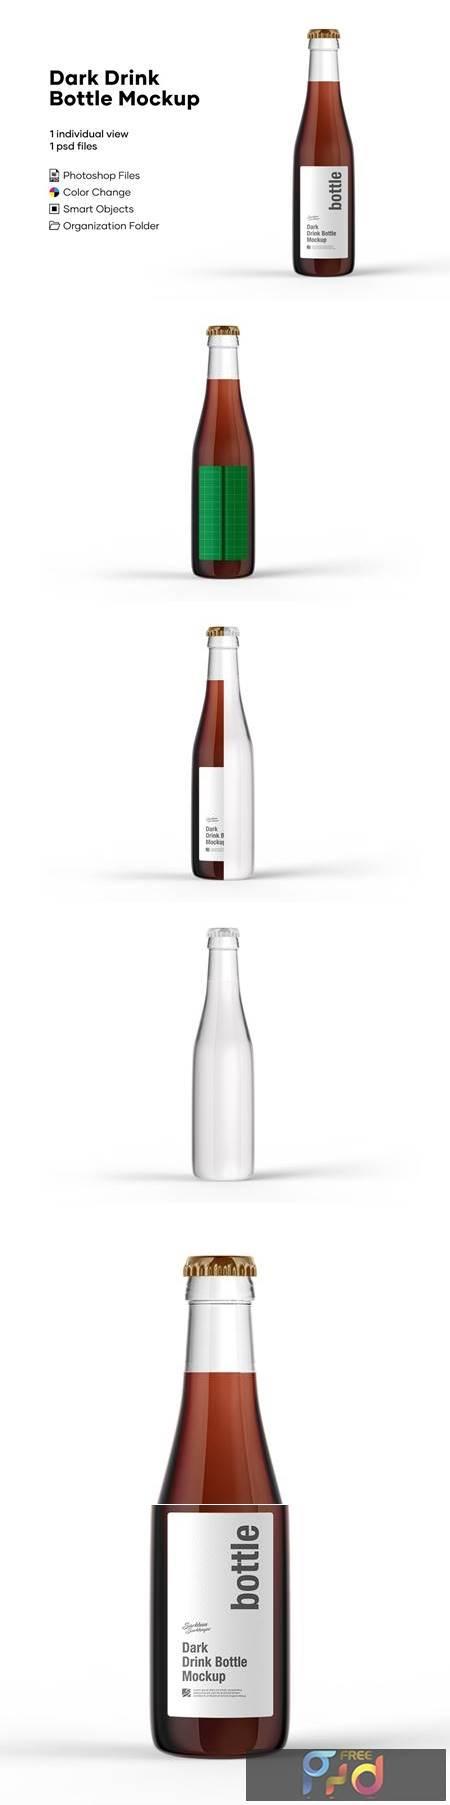 Dark Drink Bottle Mockup 5276740 1